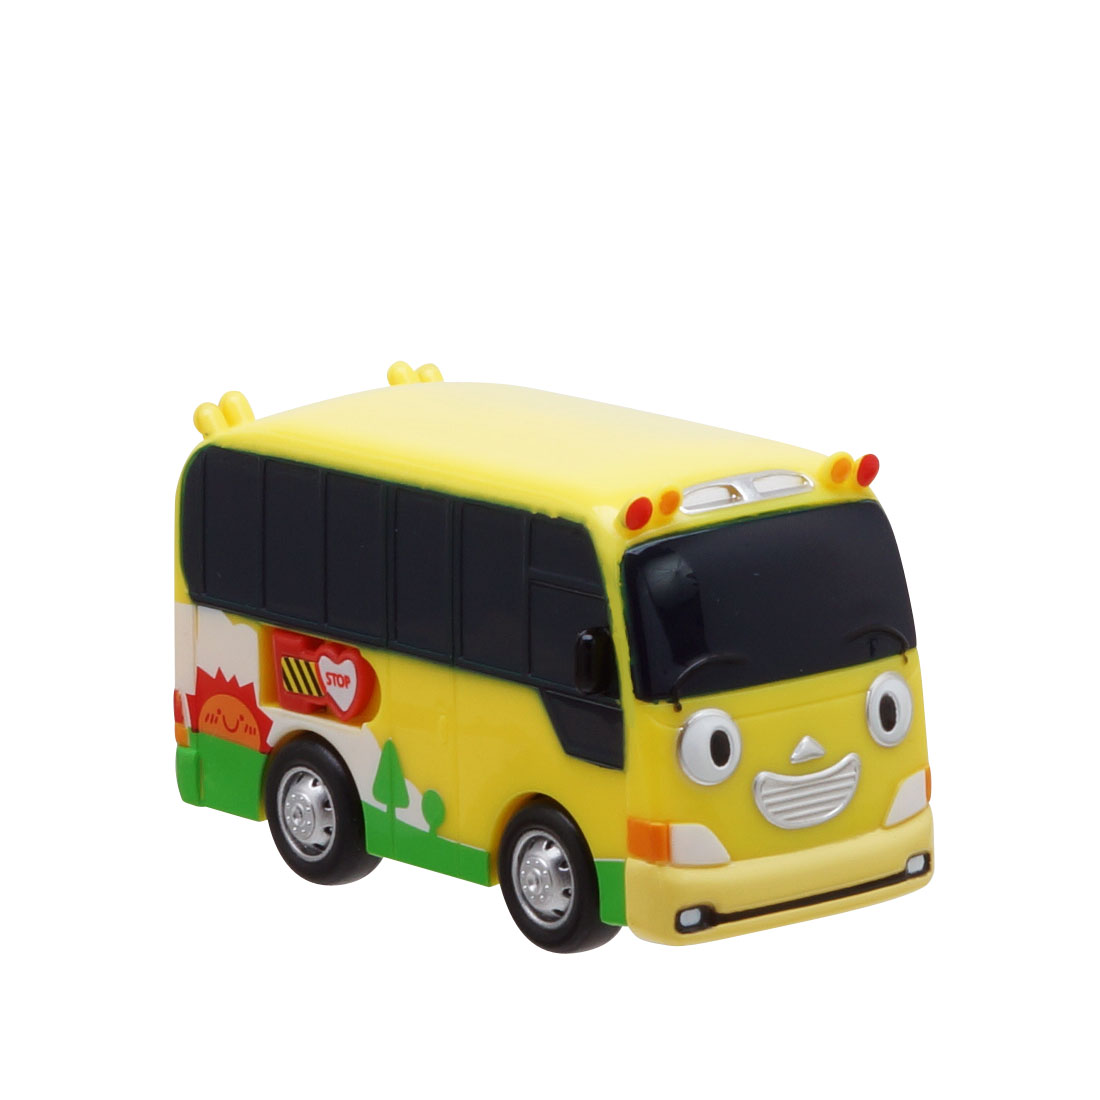 Киндер автобусы Тайо